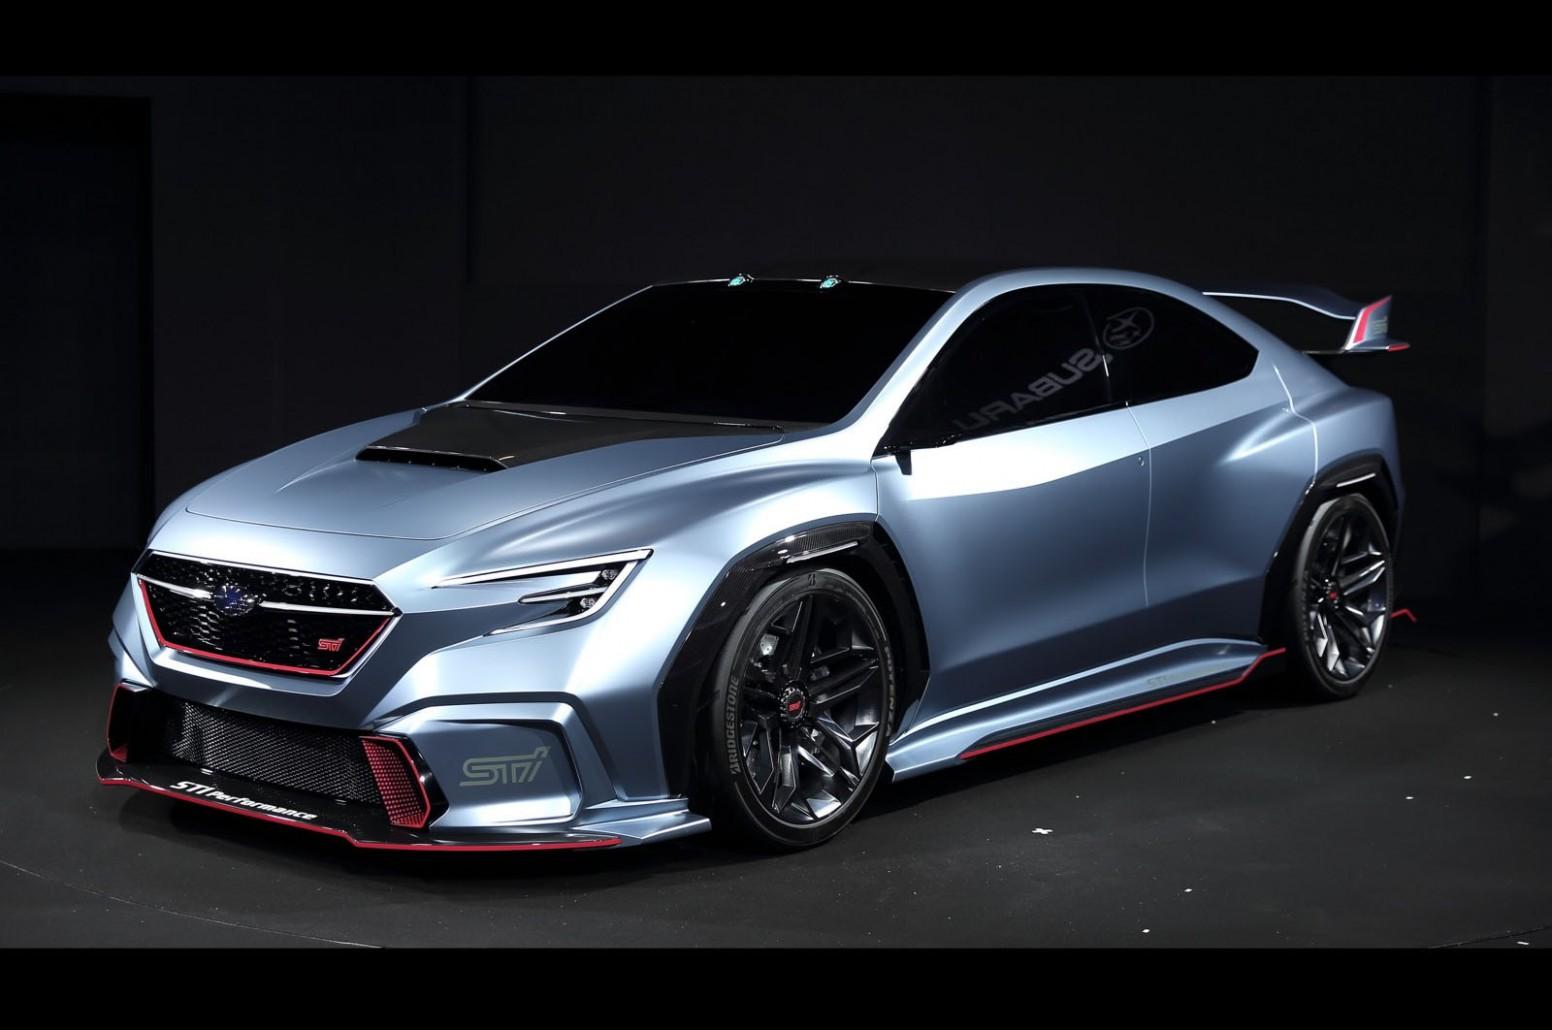 Next Subaru WRX STI Could Get 4 Horsepower and AMG Inspiration - 2021 Subaru Wrx Release Date